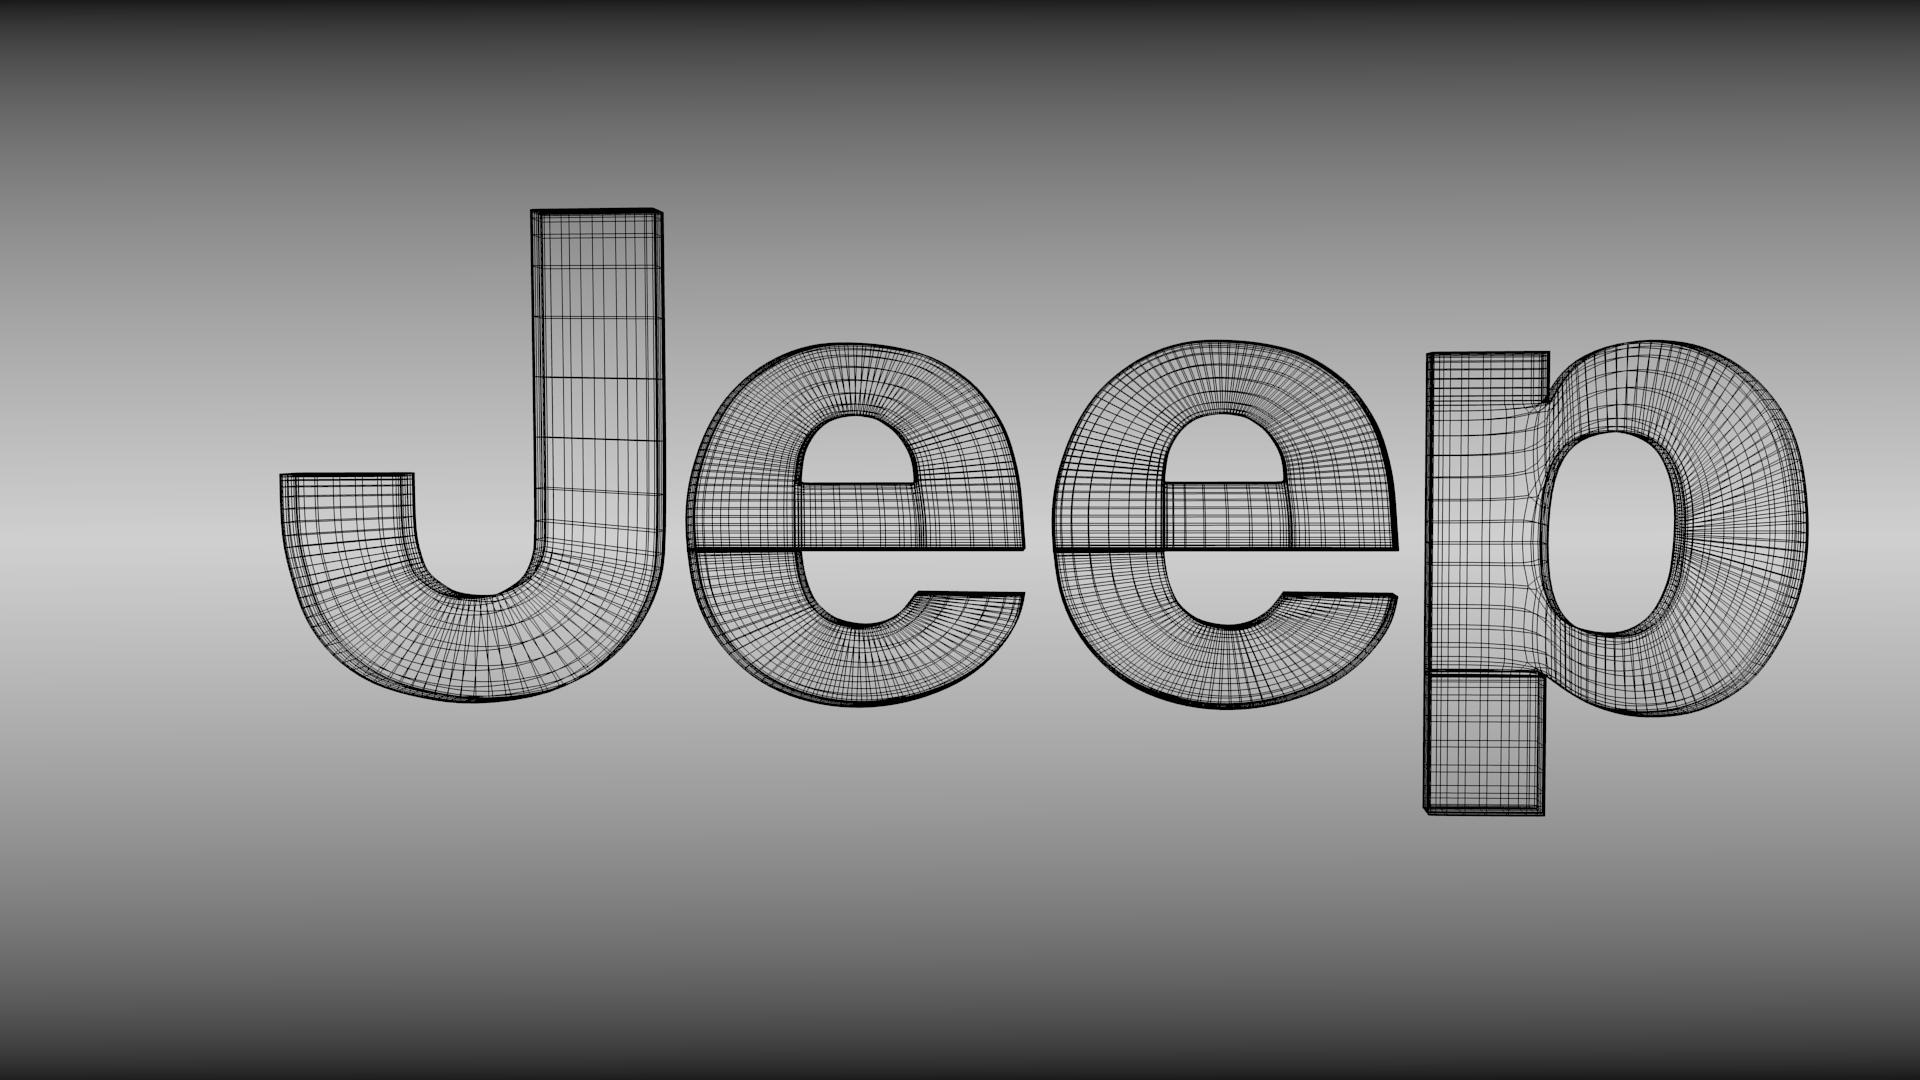 Jeep Logo Wallpaper Hd   Viewing Gallery 1920x1080